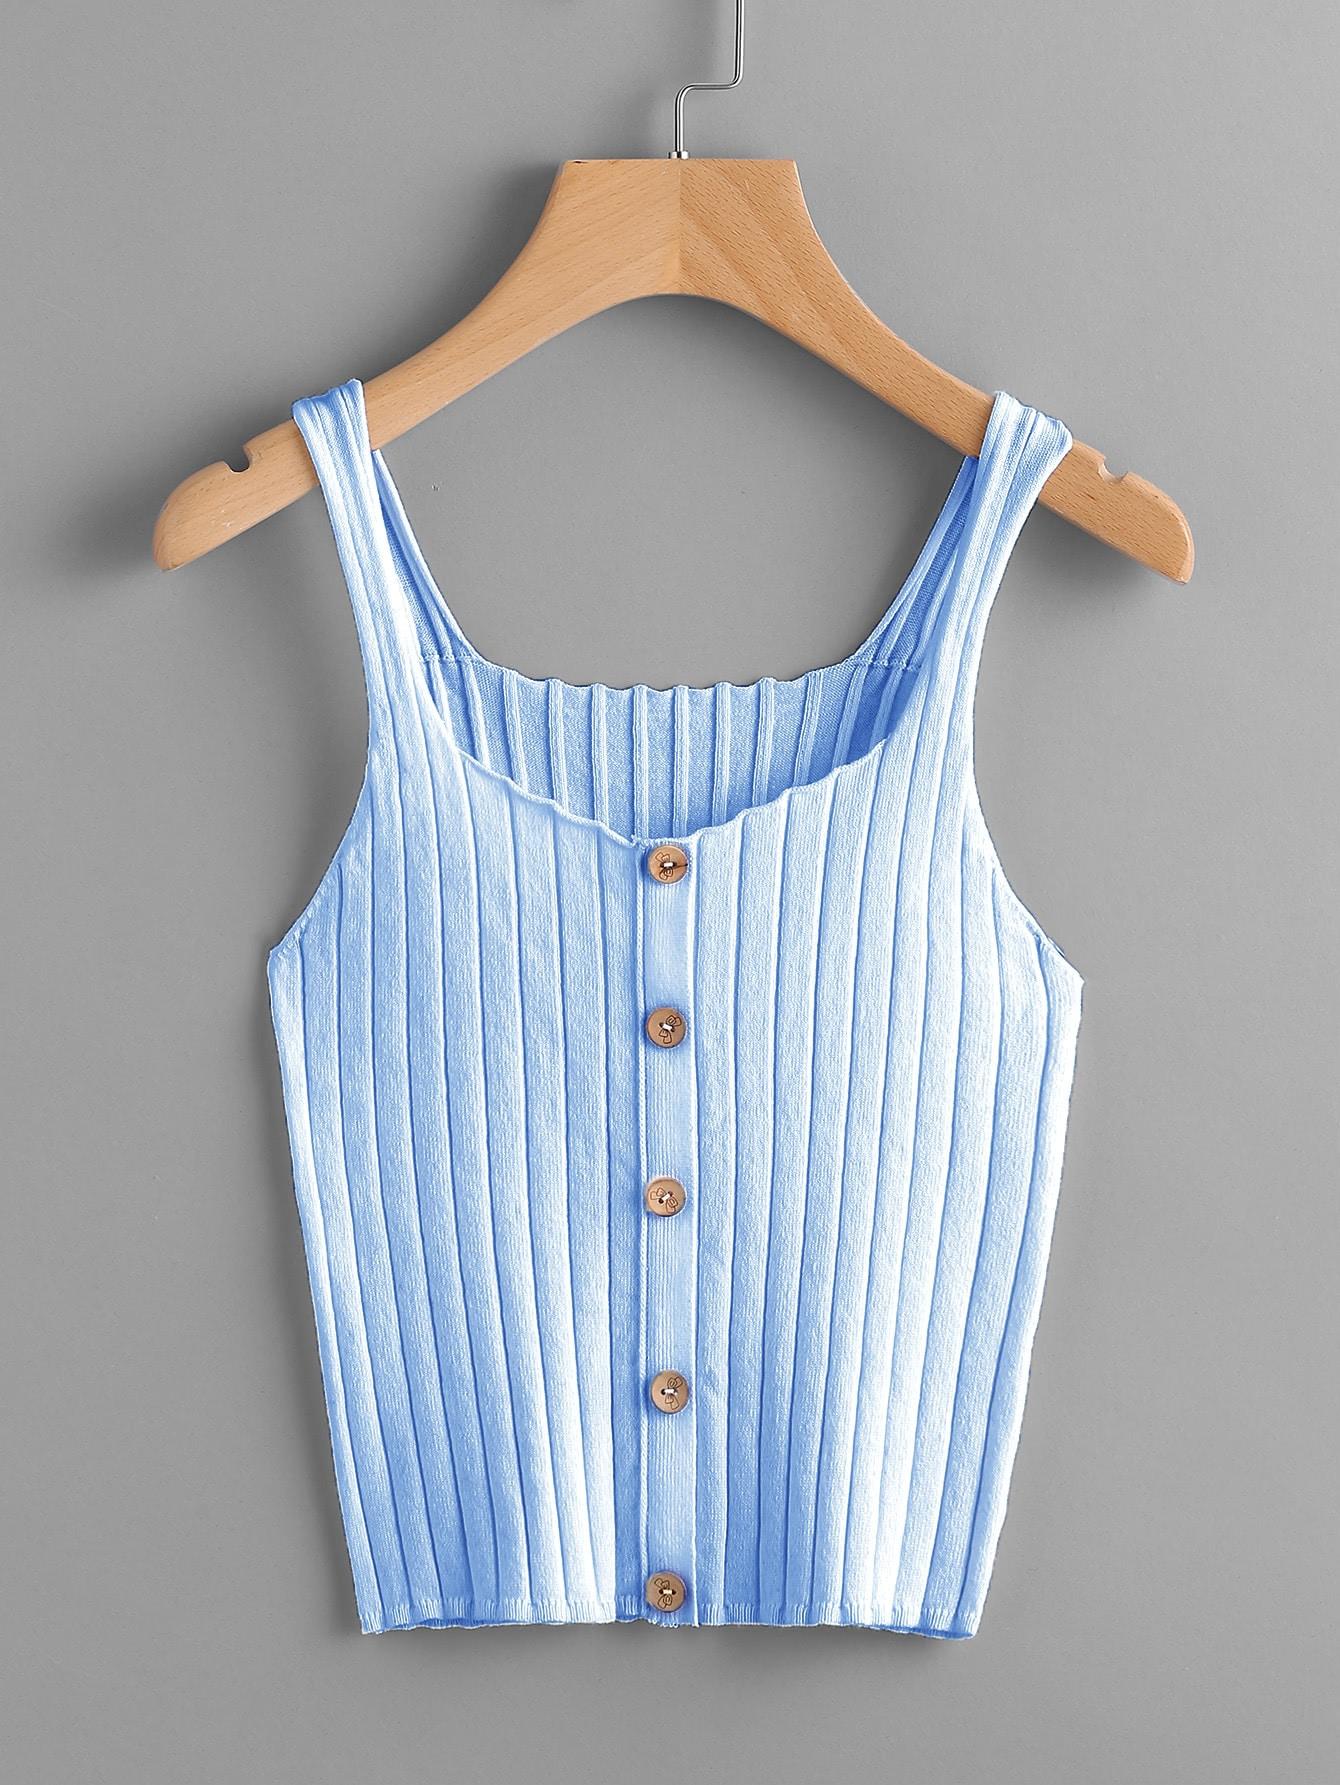 Button Front Rib Knit Top vest170712450